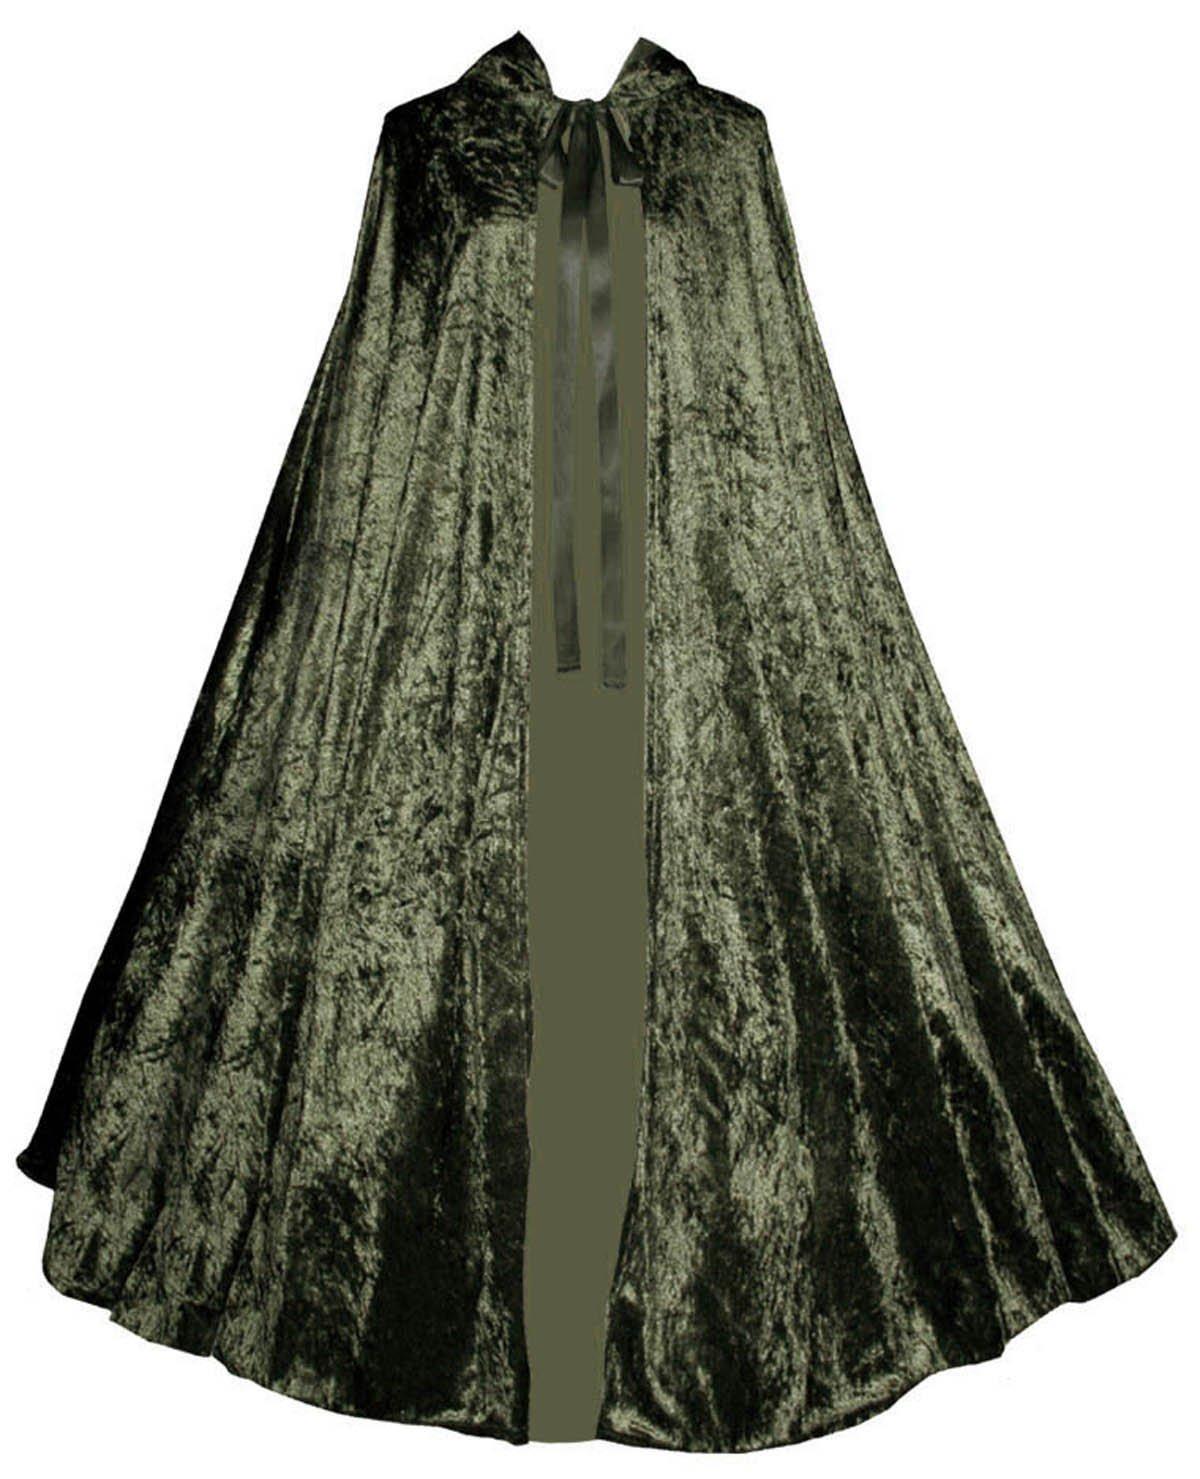 Victorian Vagabond Gothic Renaissance Steampunk Velvet Cape Cloak Olive Green 3